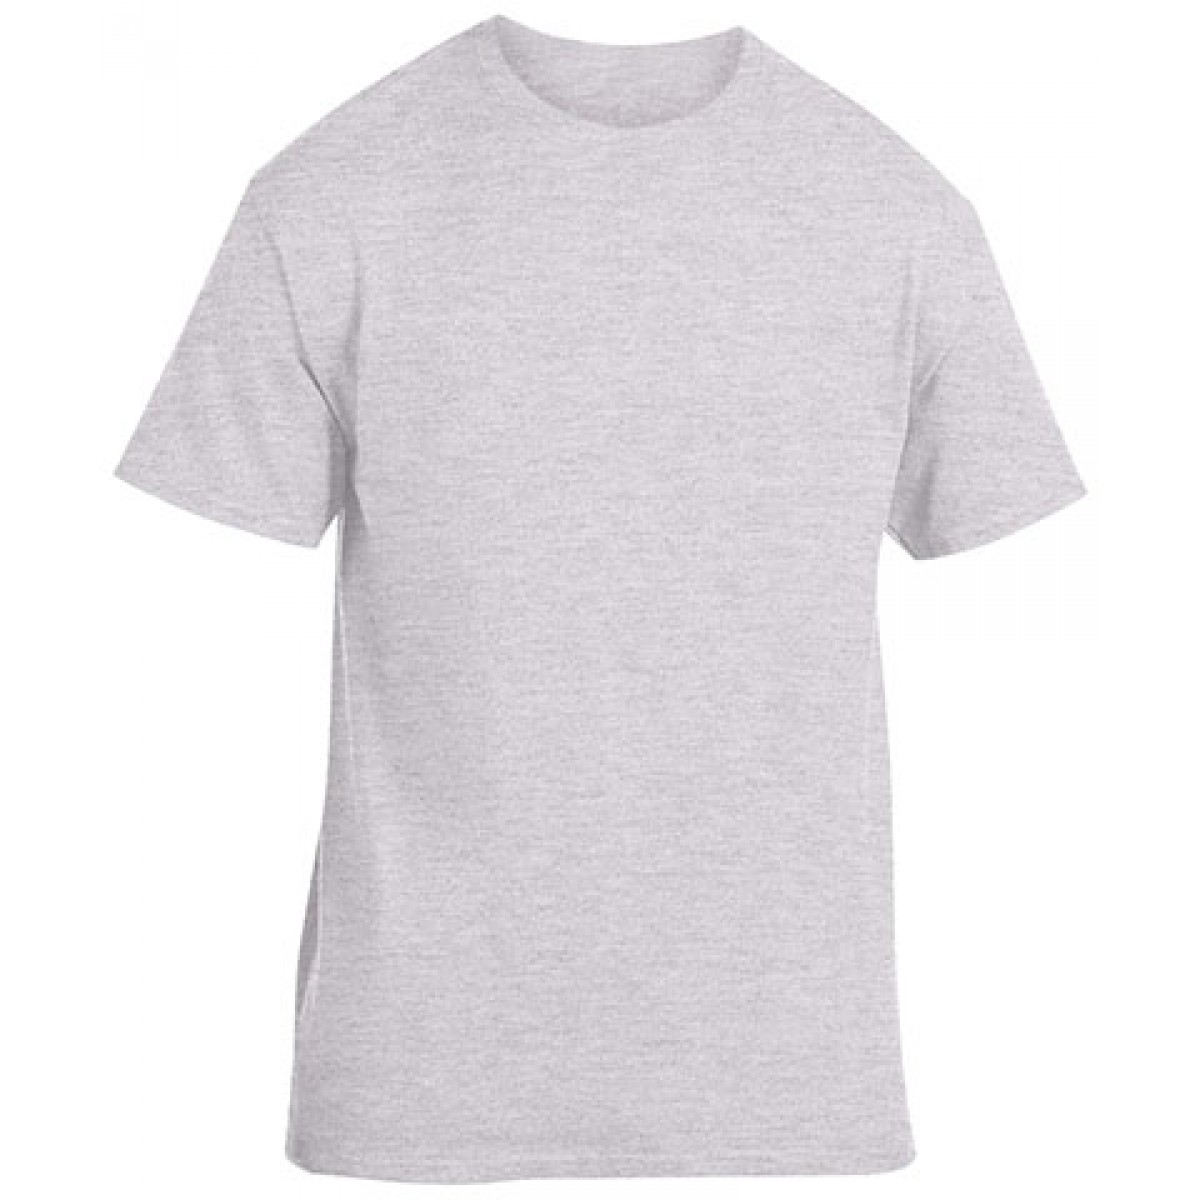 Cotton Short Sleeve T-Shirt-Sports Grey-2XL